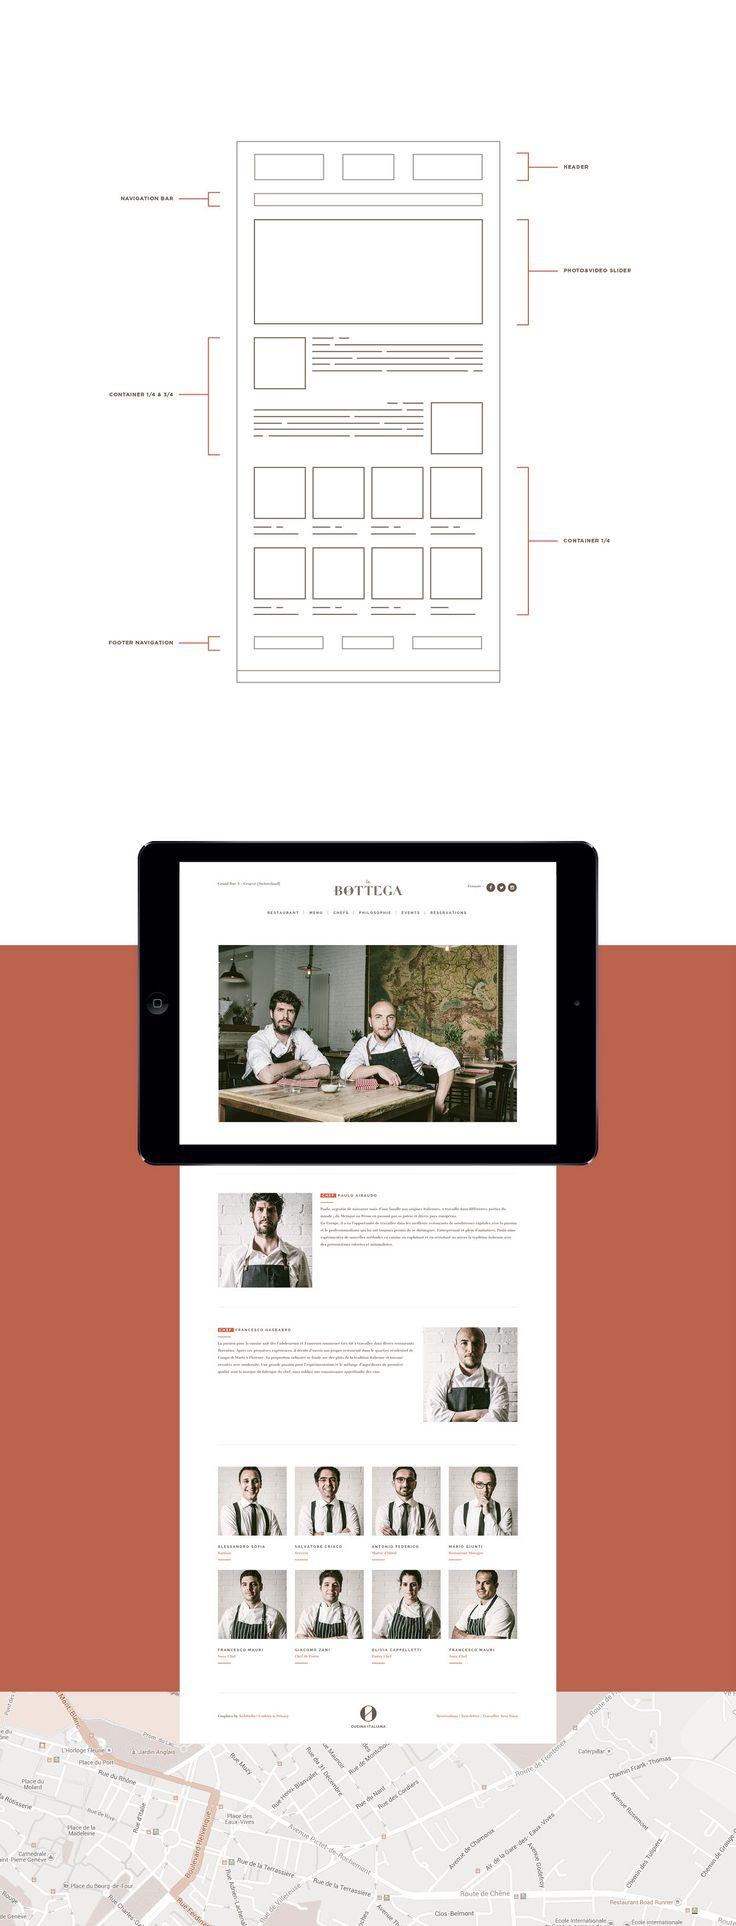 La Bottega - Cucina Italiana by Multiple Owners